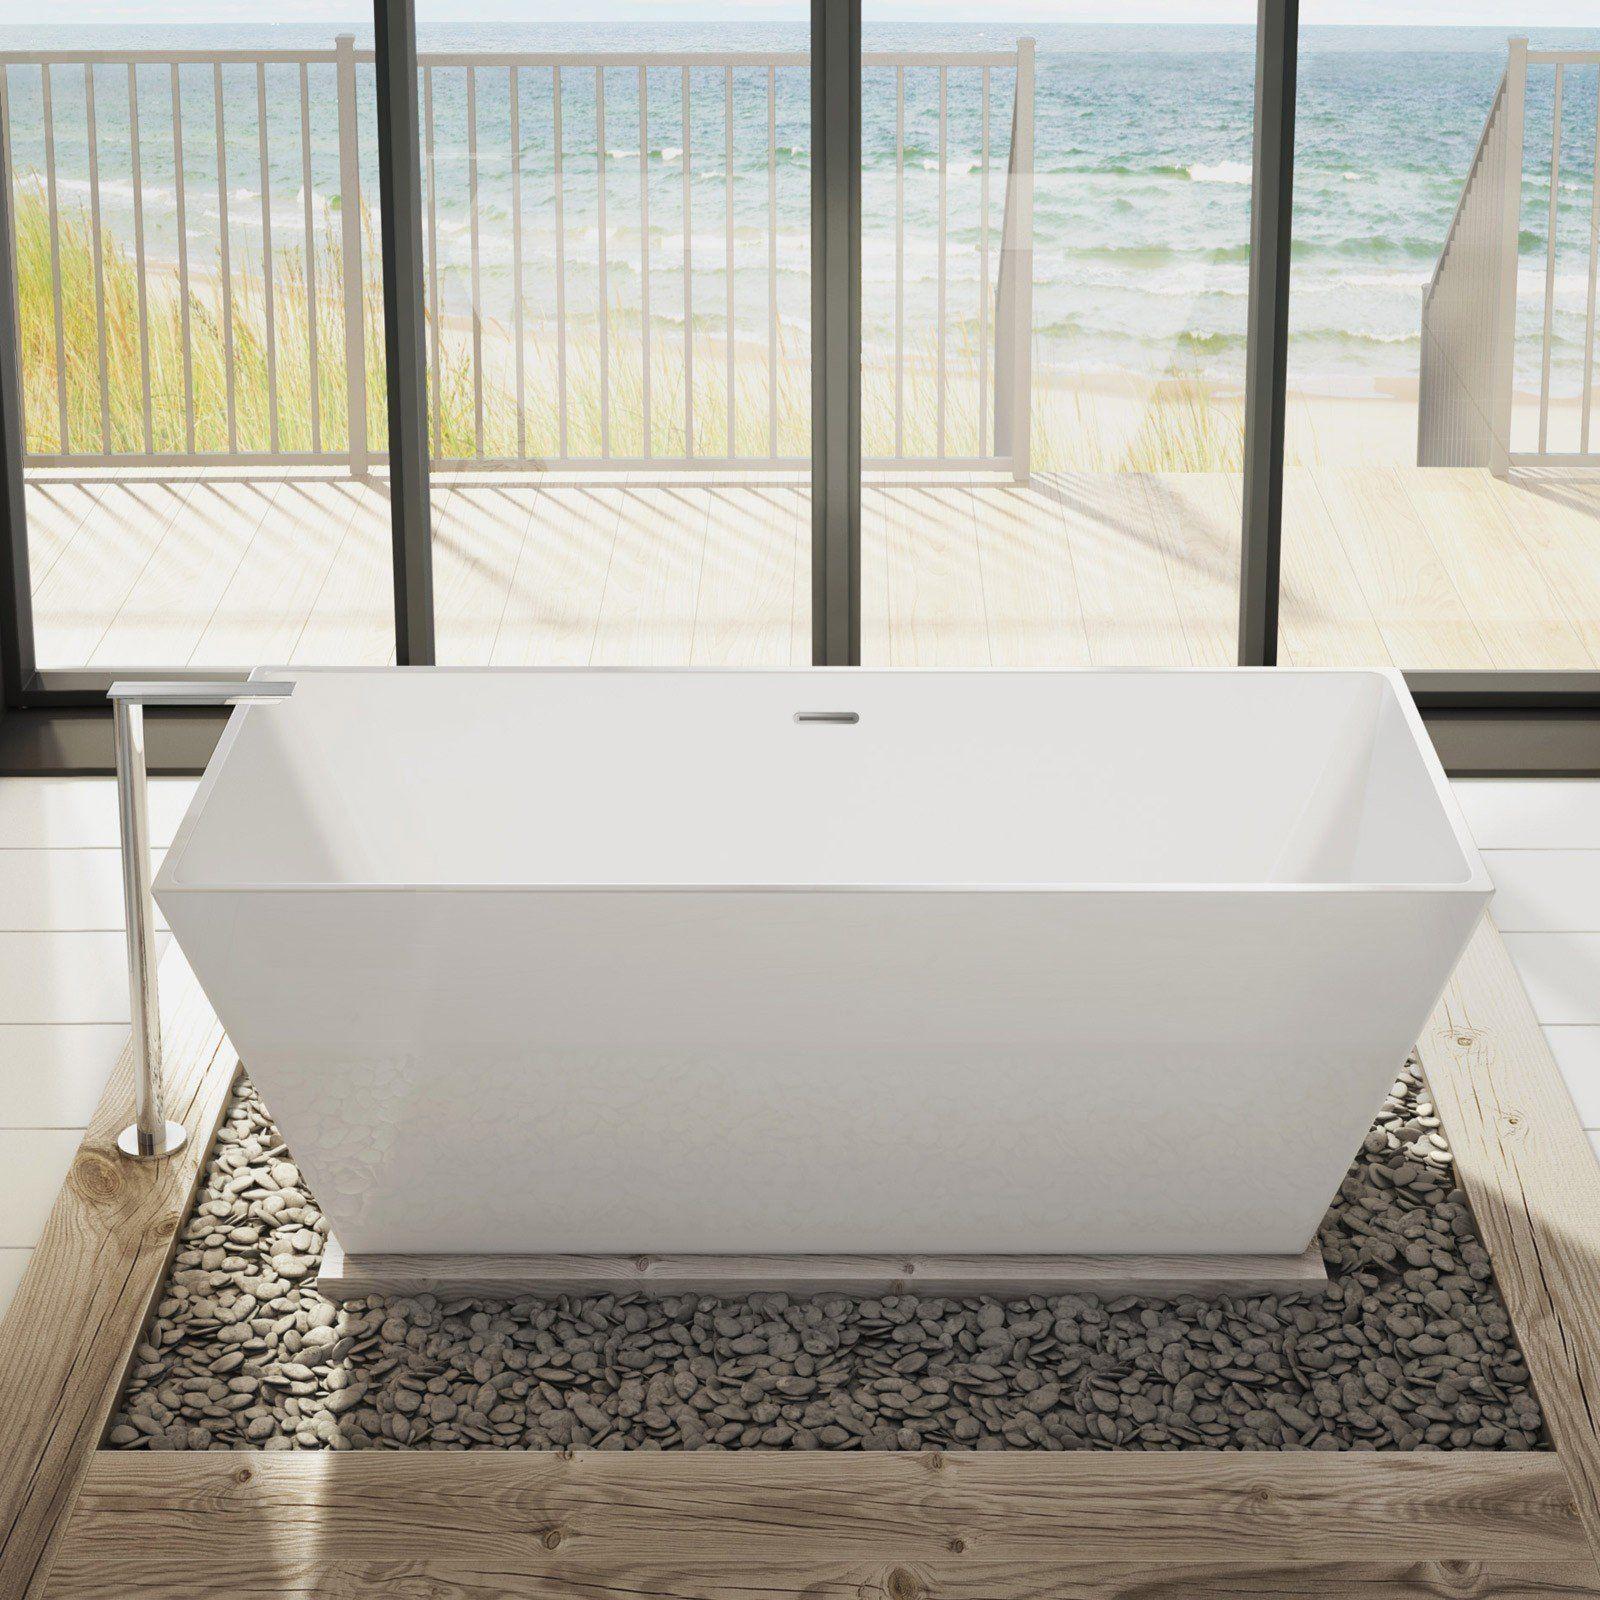 Aria Calando Petite 56 Inch Acrylic Double Ended Freestanding Bathtub Free Standing Bath Tub Vintage Tub Contemporary Tub